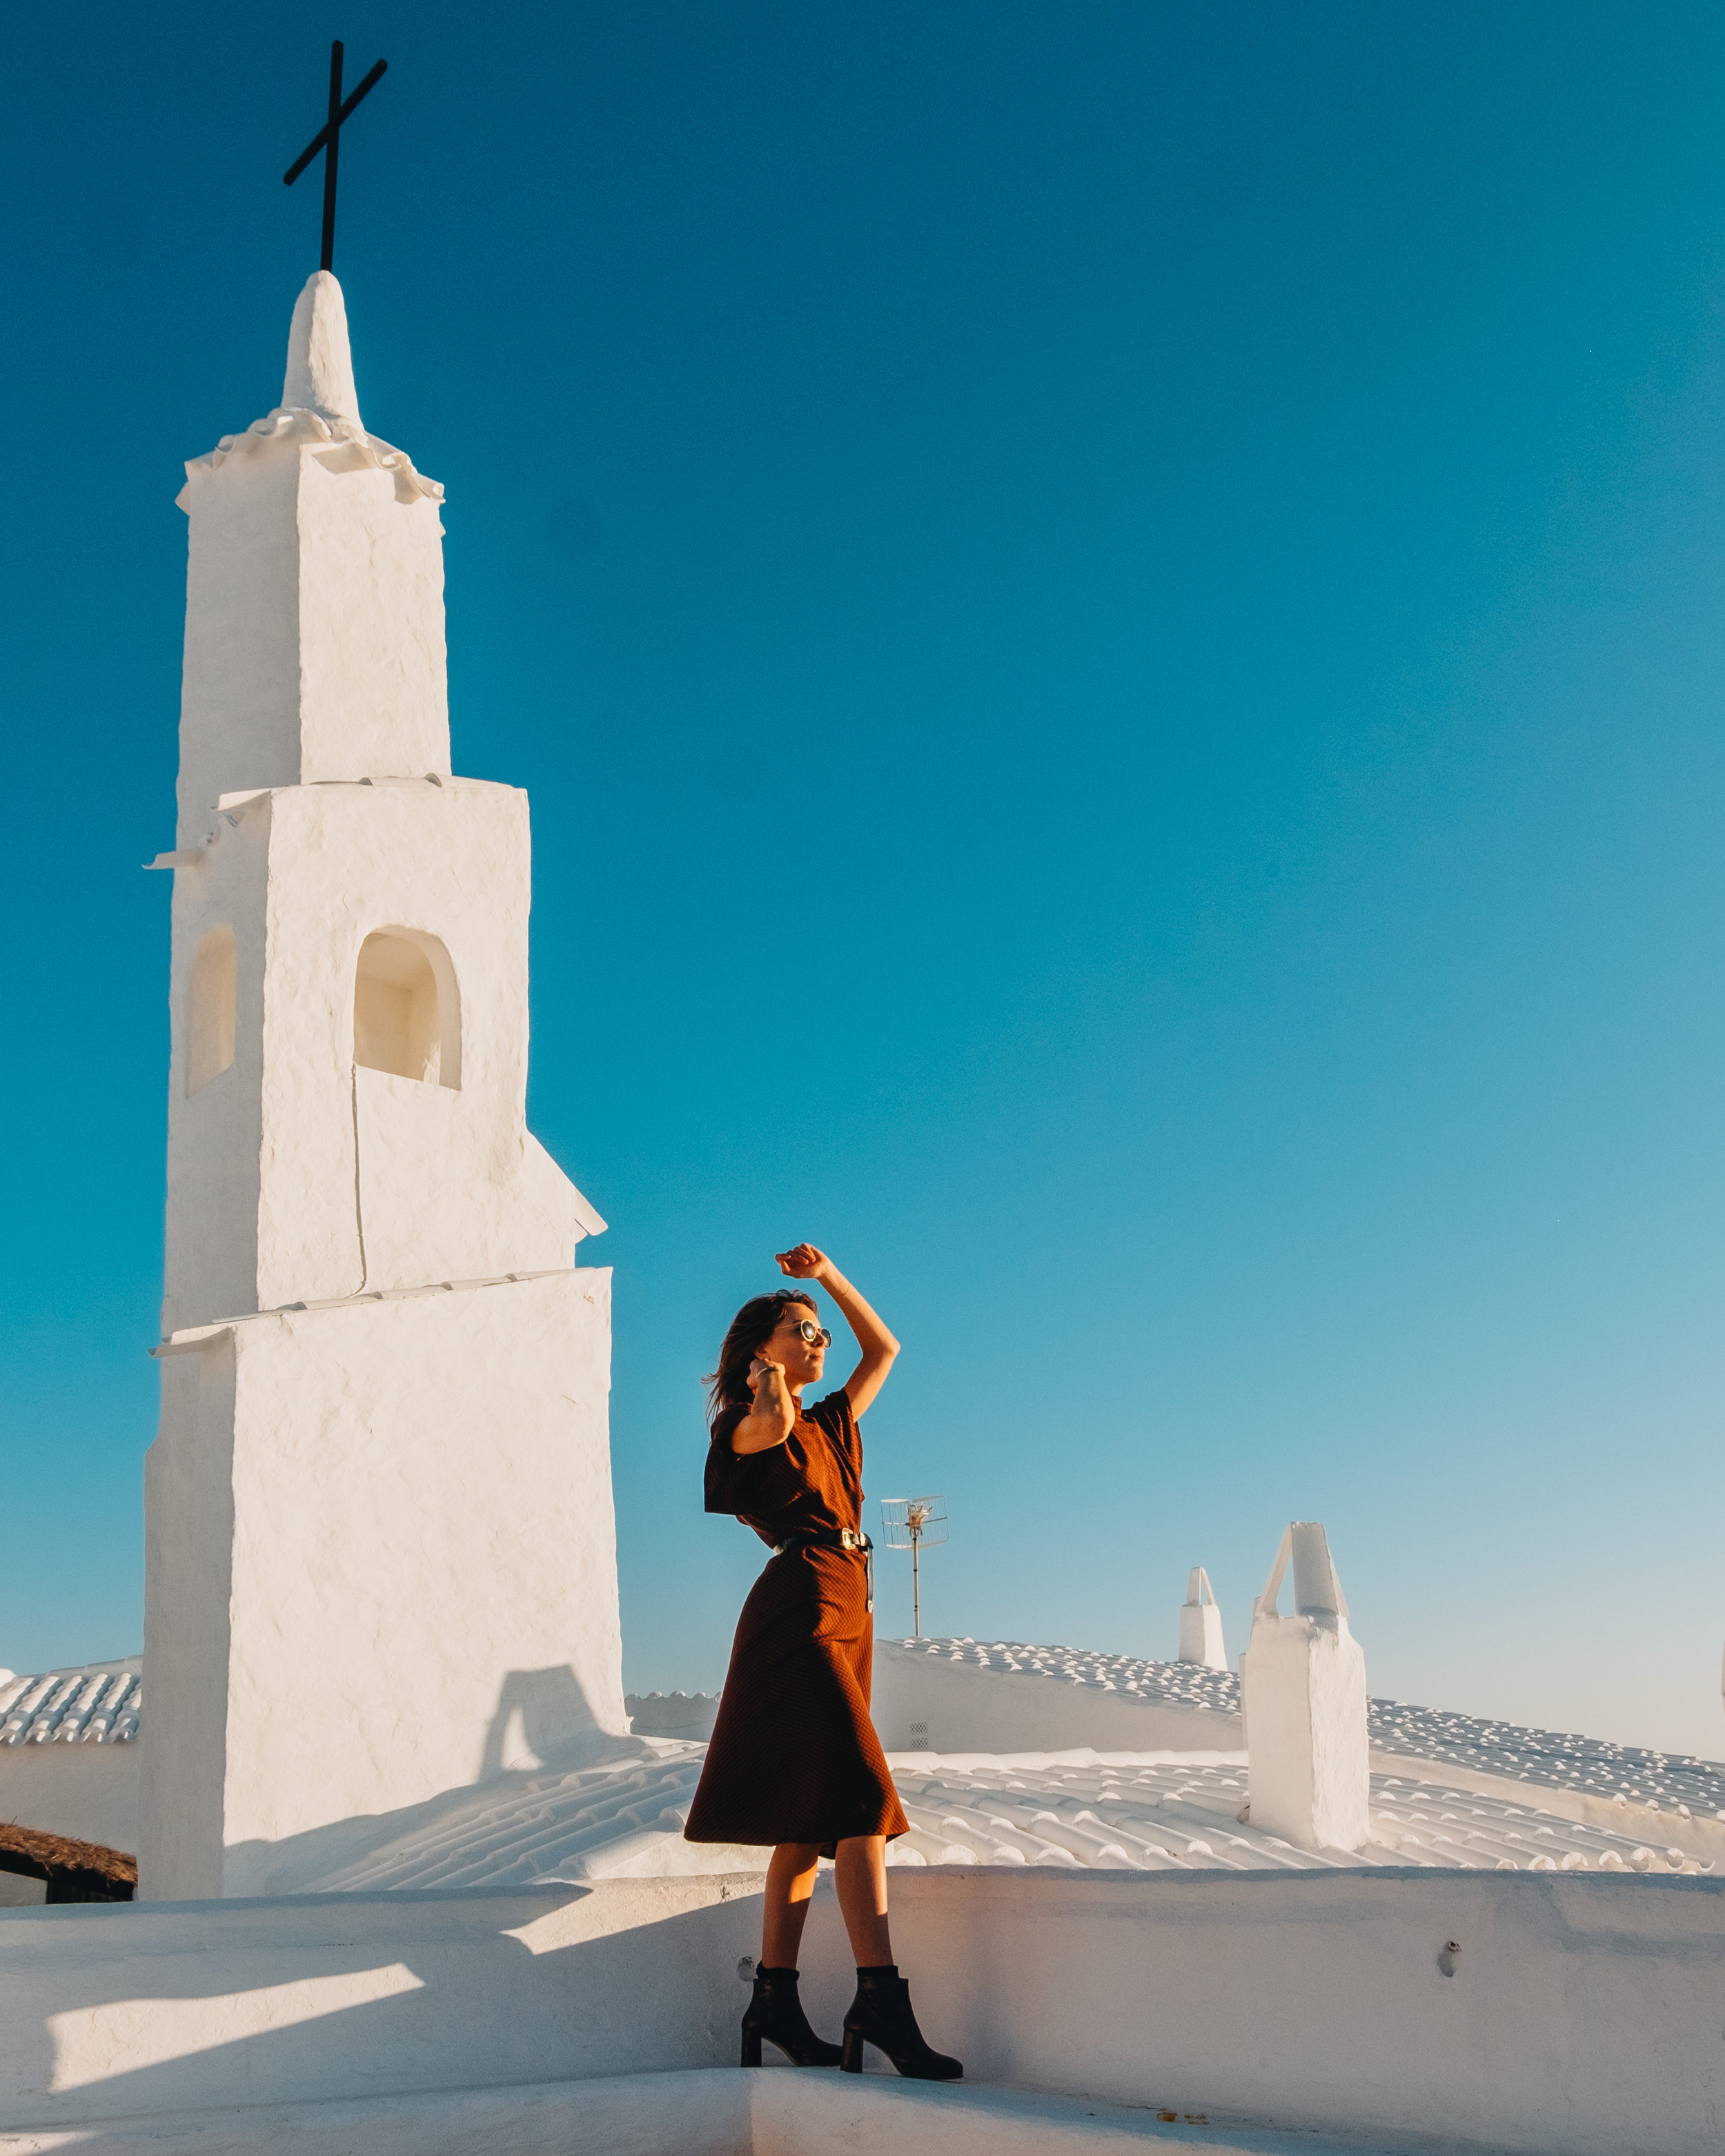 Turismo Menorca